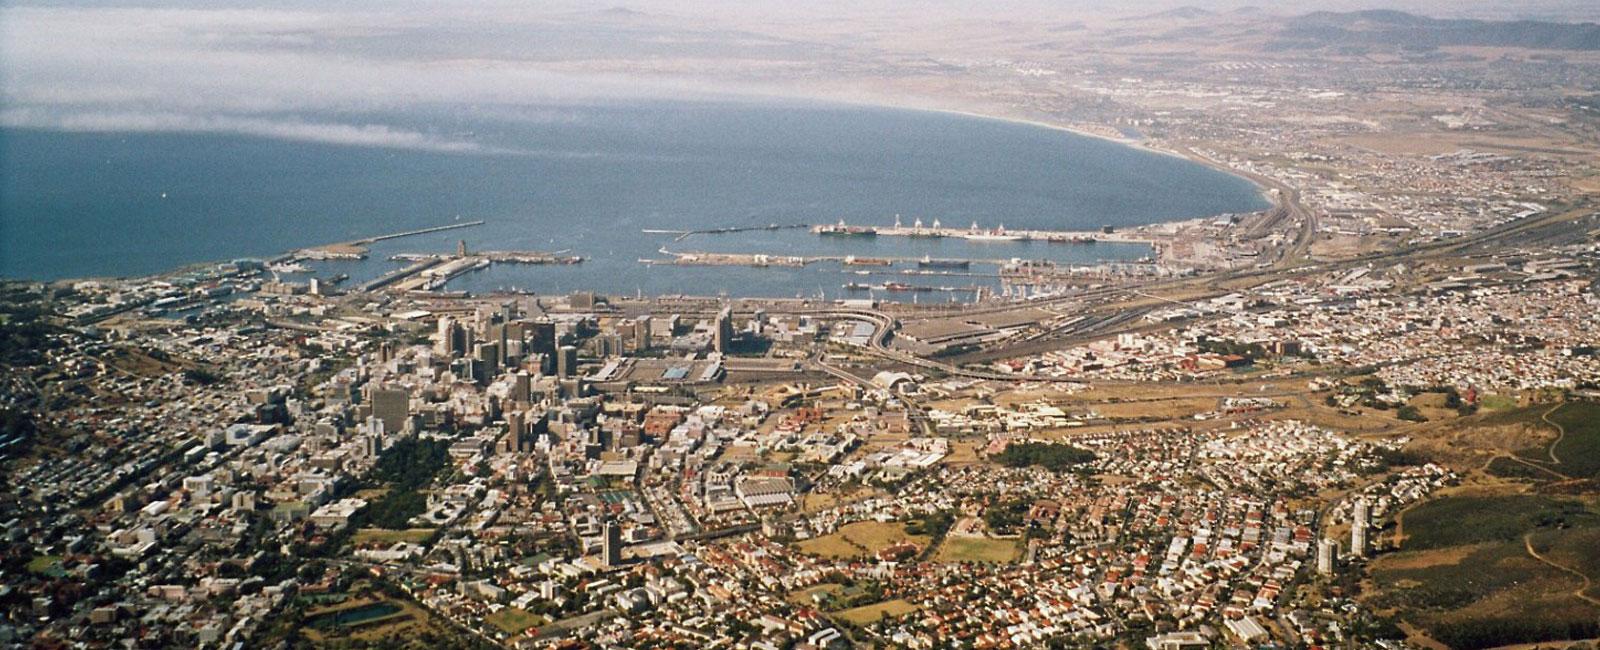 Town Regional Planning